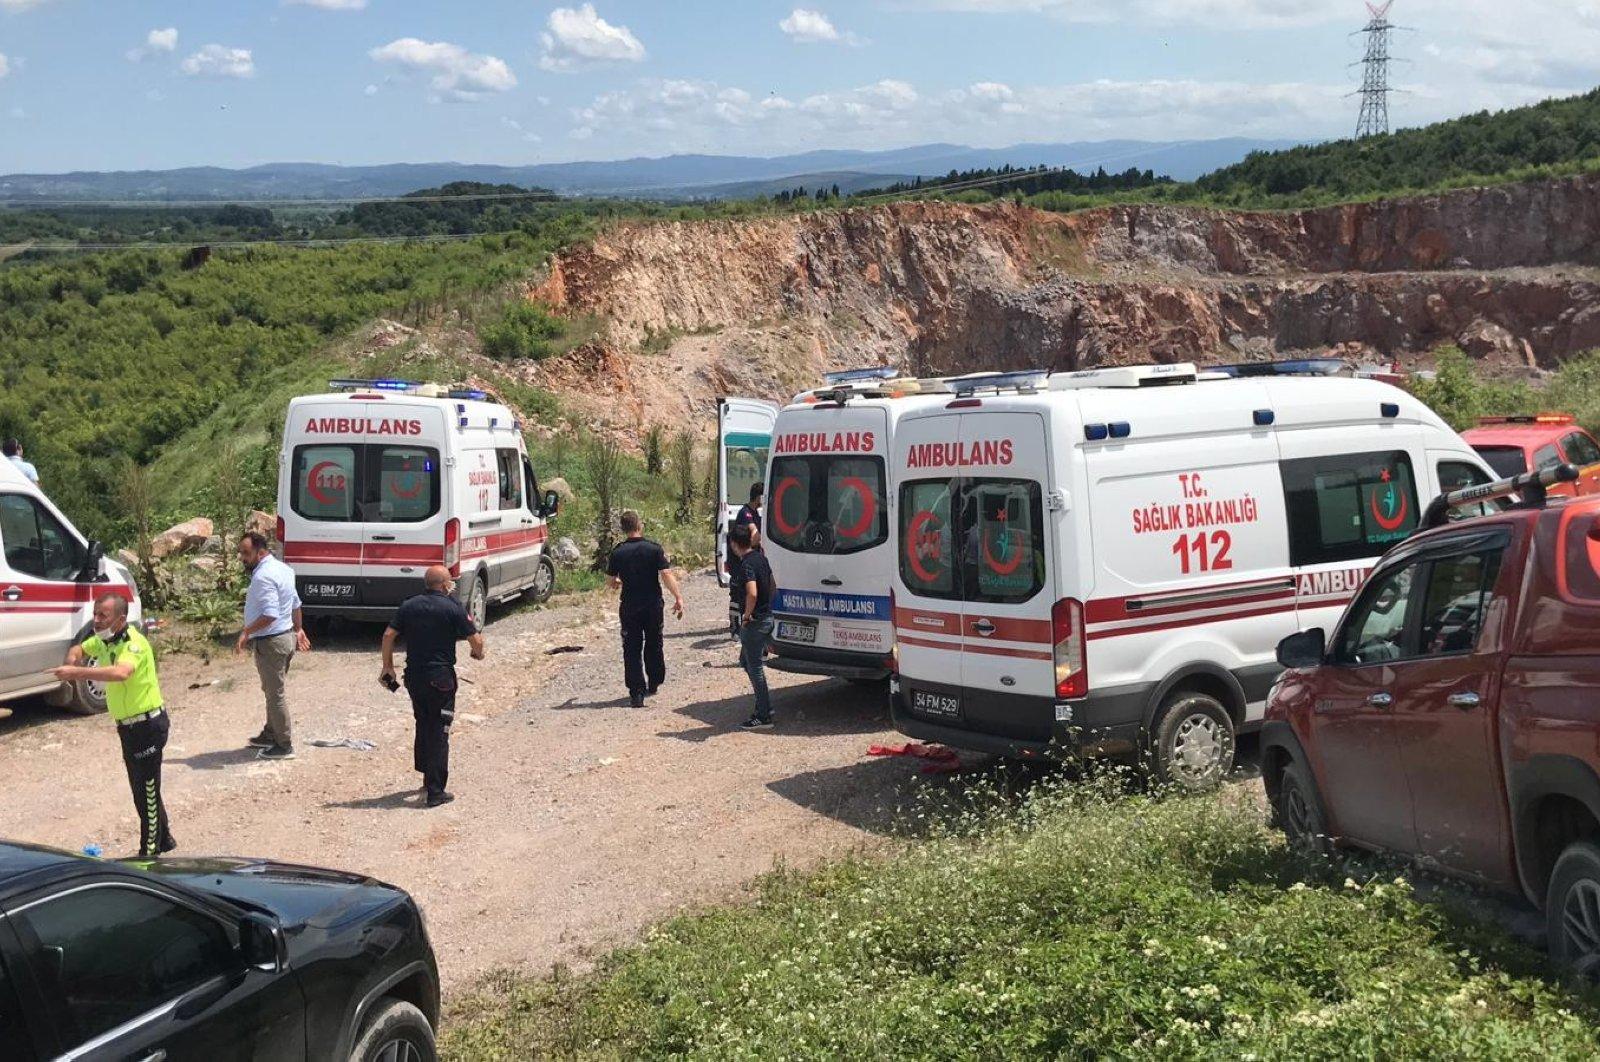 Ambulances are seen at the scene of the explosion, in Sakarya, Turkey, July 9, 2020. (IHA Photo)